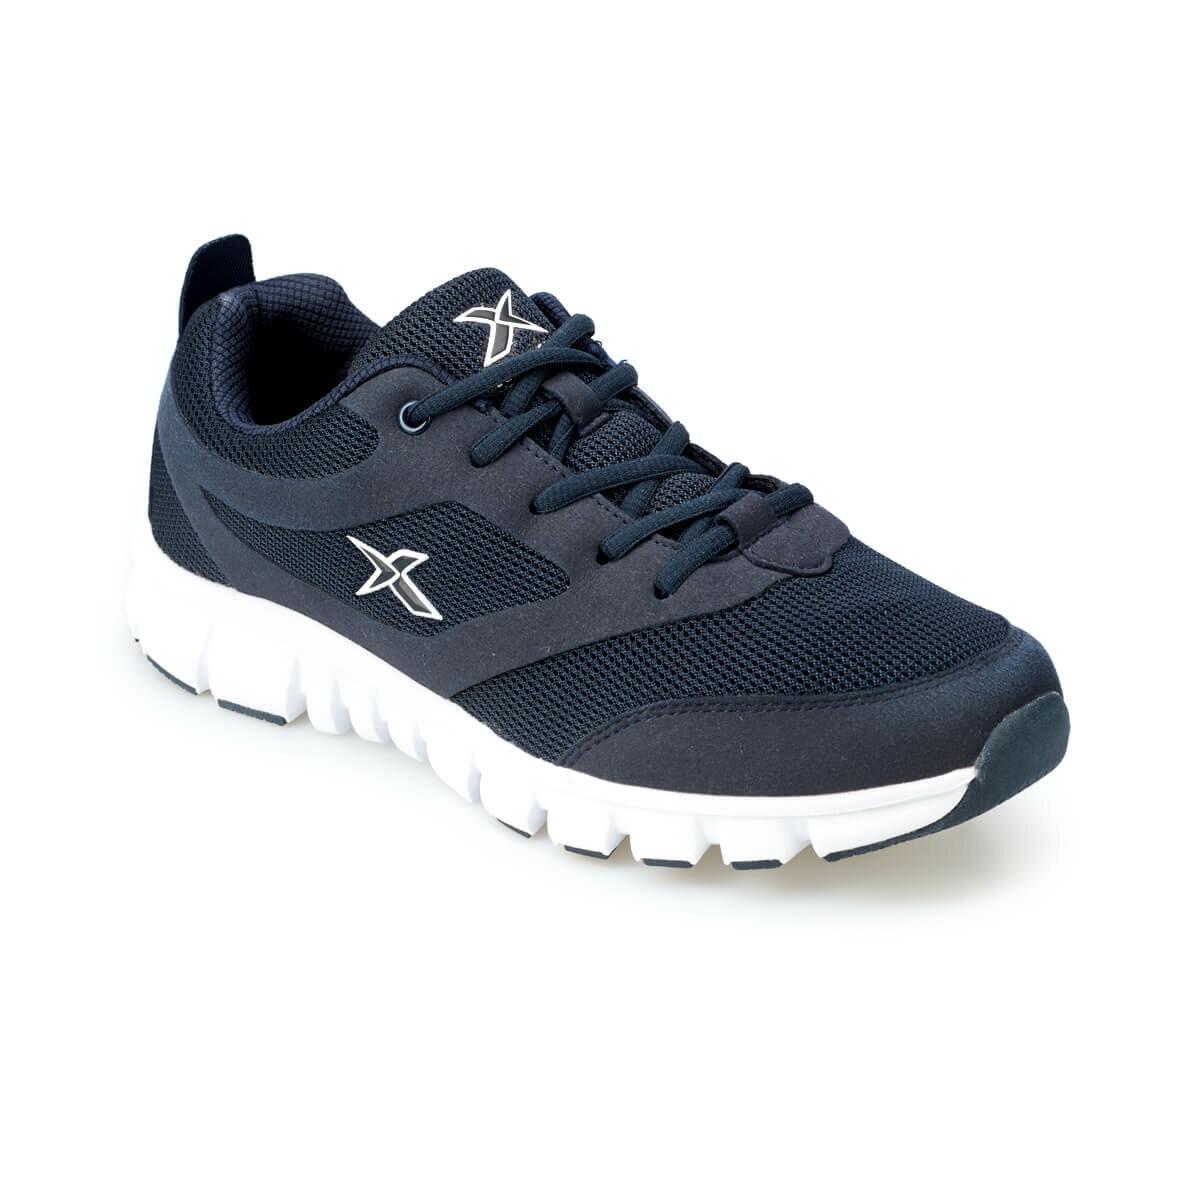 FLO ALMERA Navy Blue Men 'S Fitness Shoes KINETIX